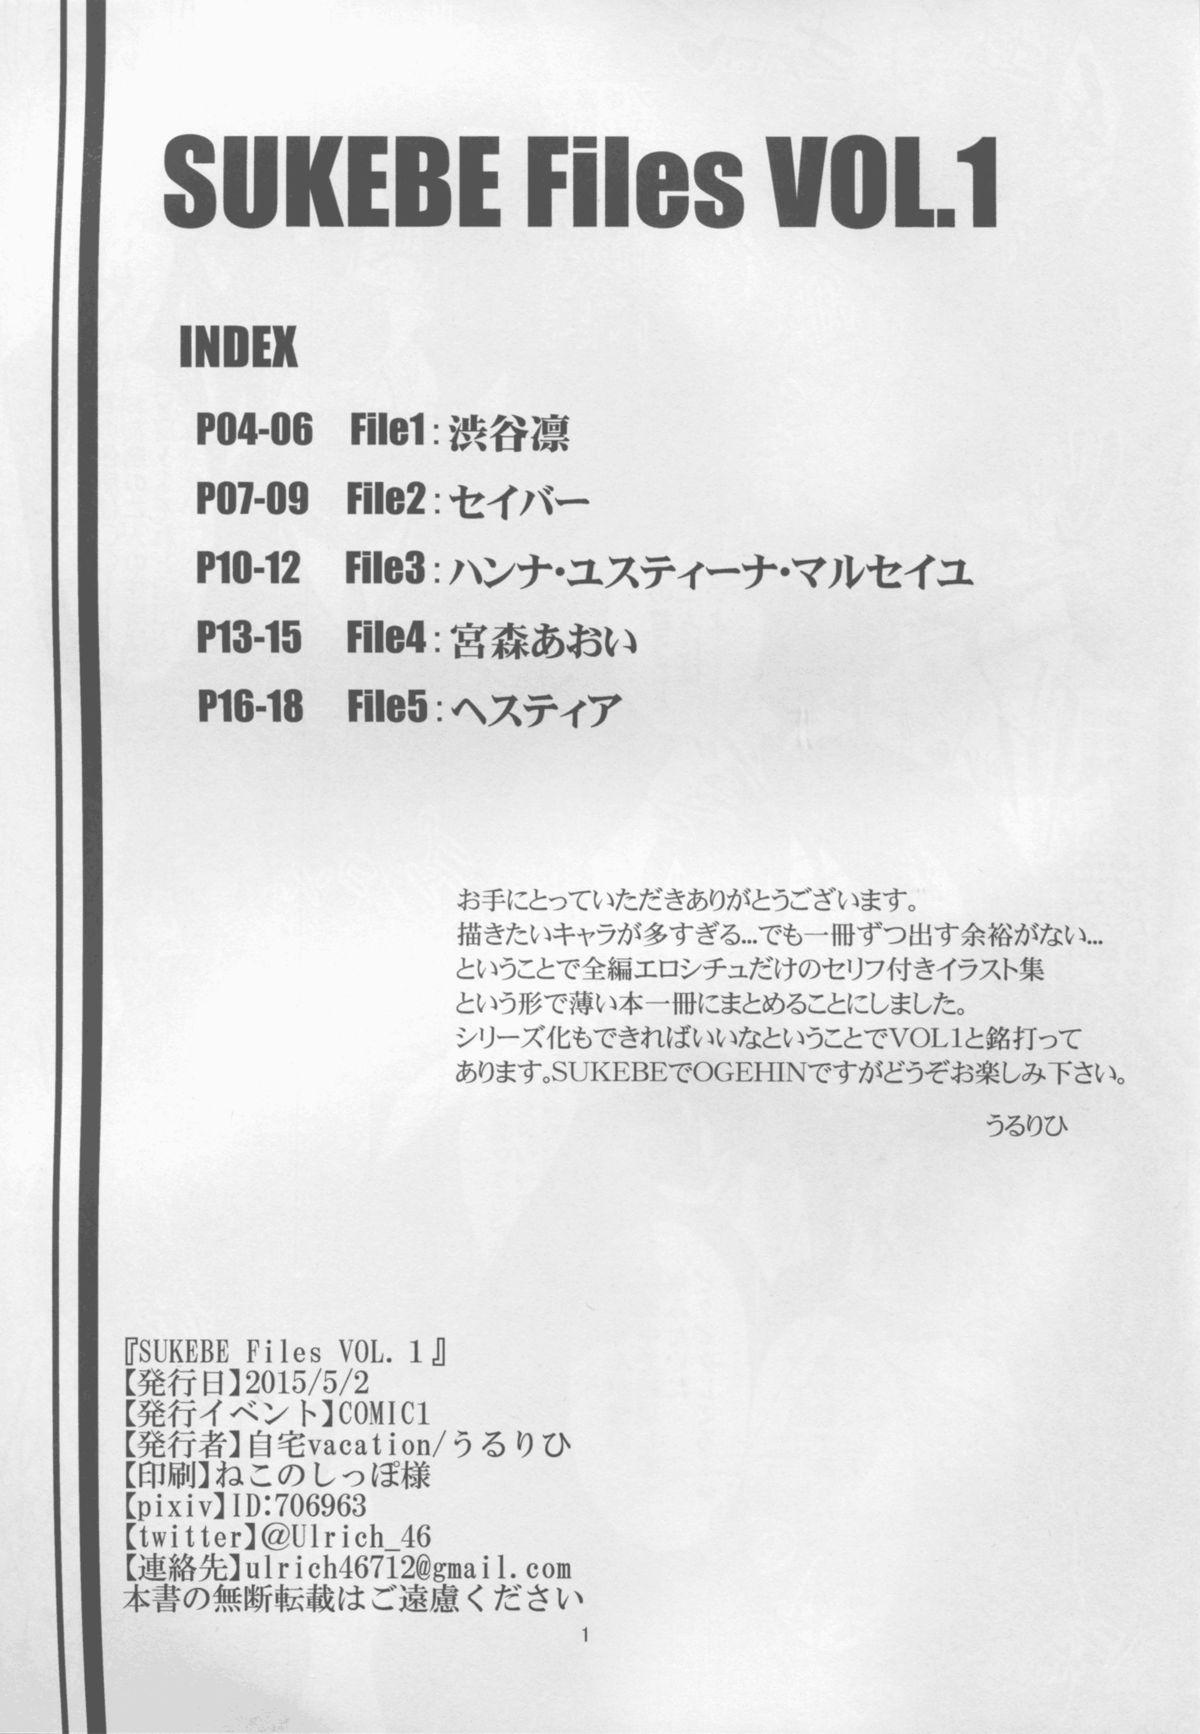 SUKEBE Files VOL. 1 2